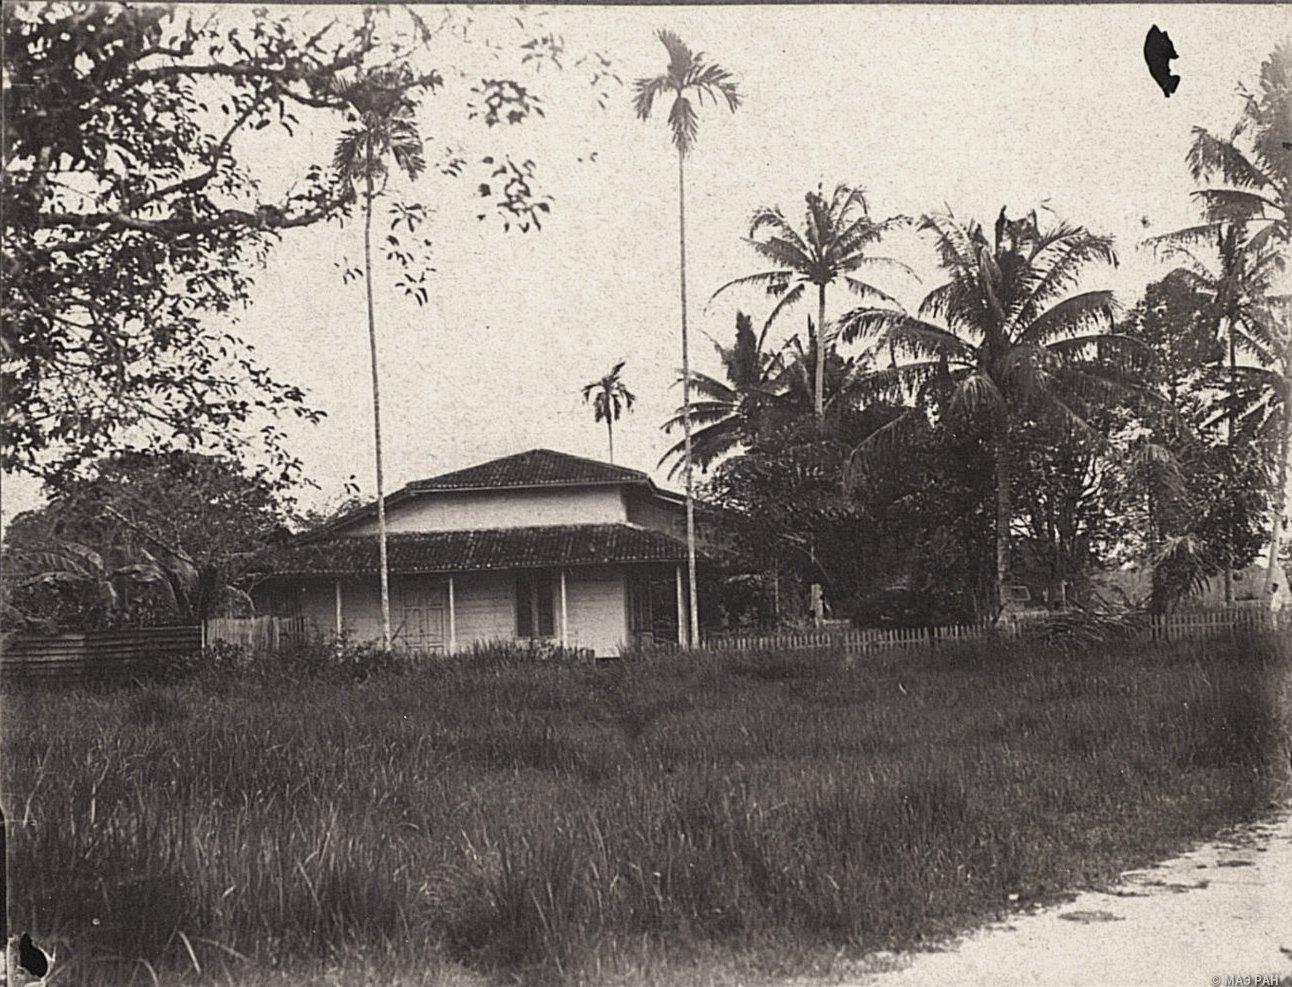 Дом Оскара Иона в Сиаке, вид сбоку. Суматра